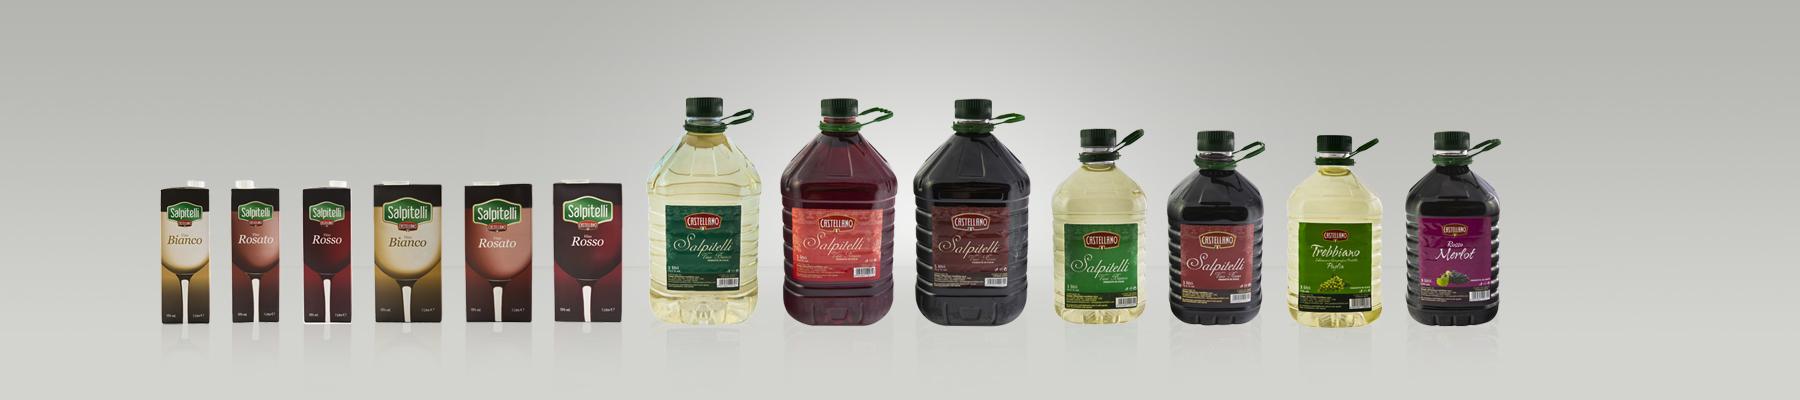 castellano-vini-prodotti-slide